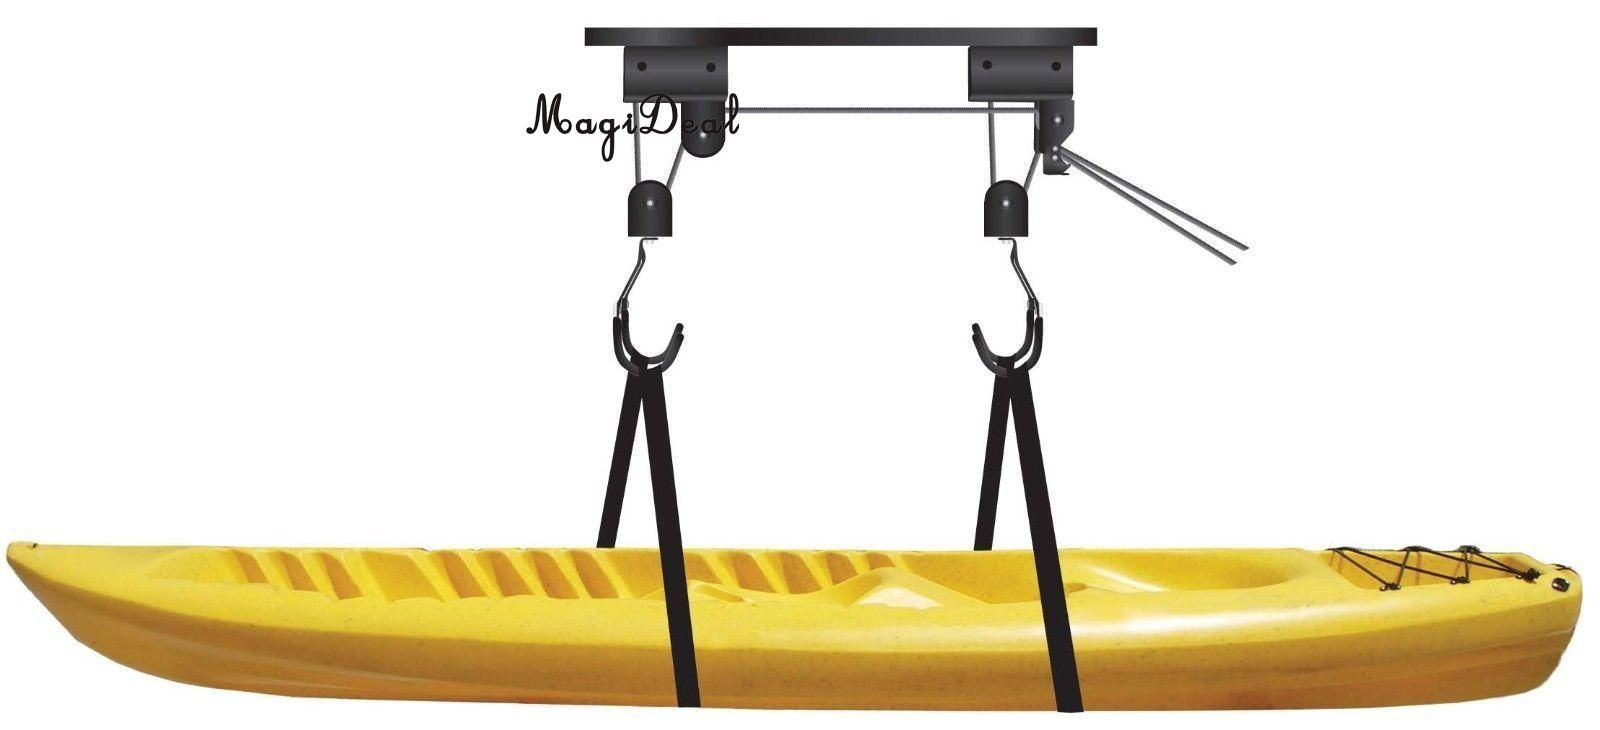 MagiDeal Kayak / Canoe / Bike / Ladder Hoist & Lift Pulley System for Storage in Shop or Garage - 100 lb. Capacity